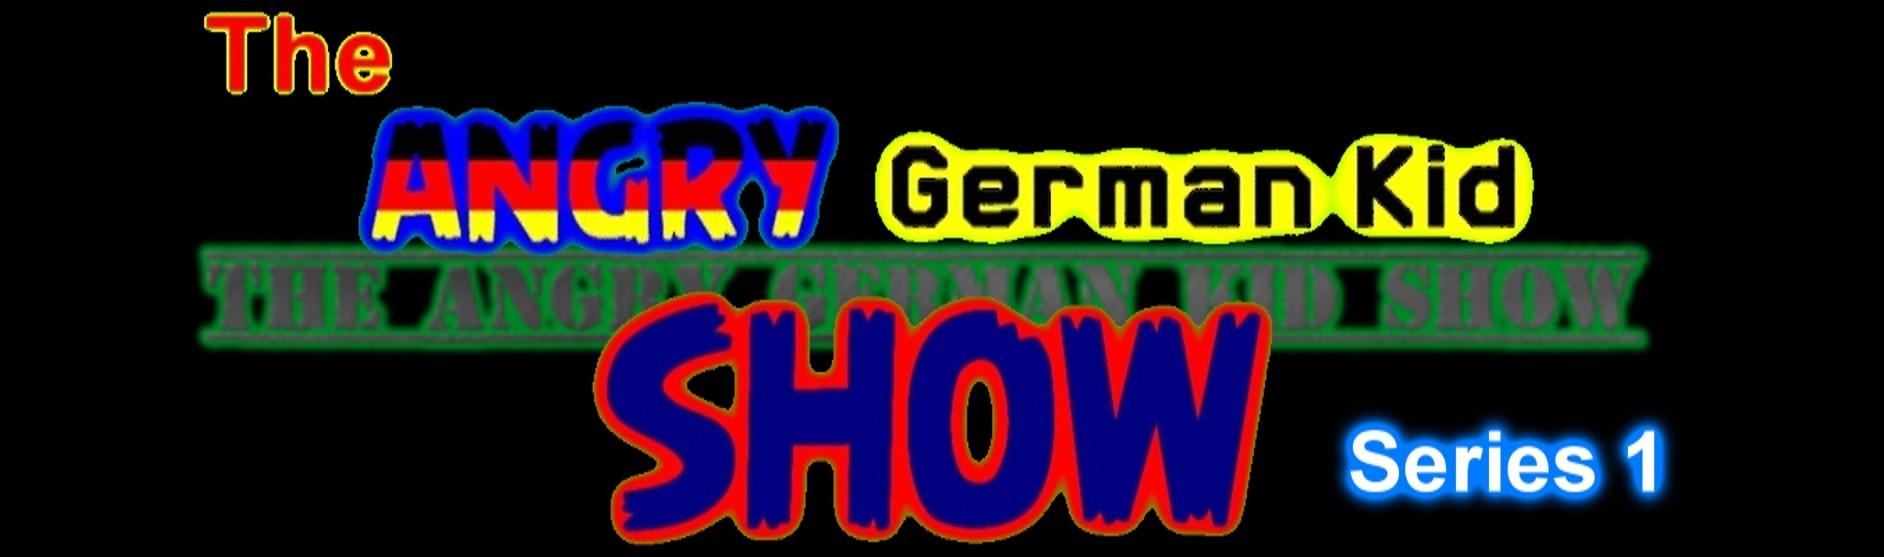 Image - Image29 - Copy.jpg | Angry German Kid Wiki ...